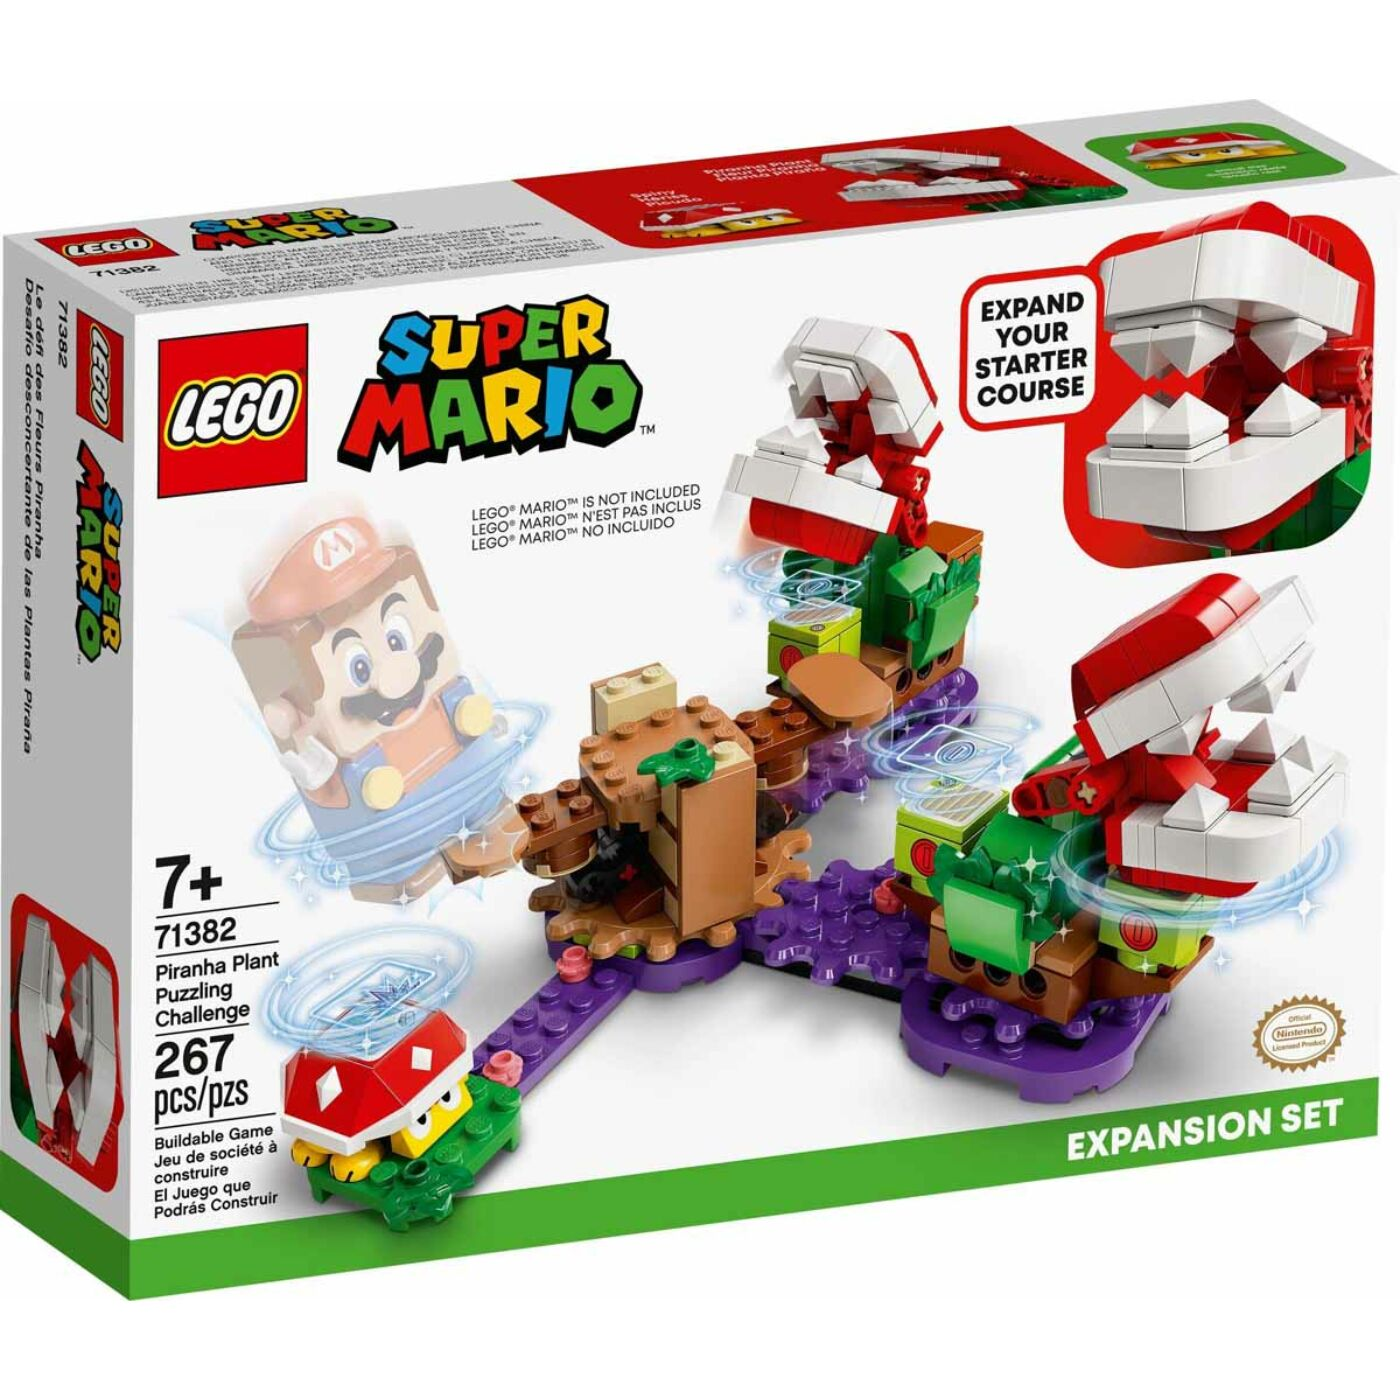 Lego Super Mario A Piranha növény rejtélyes feladata